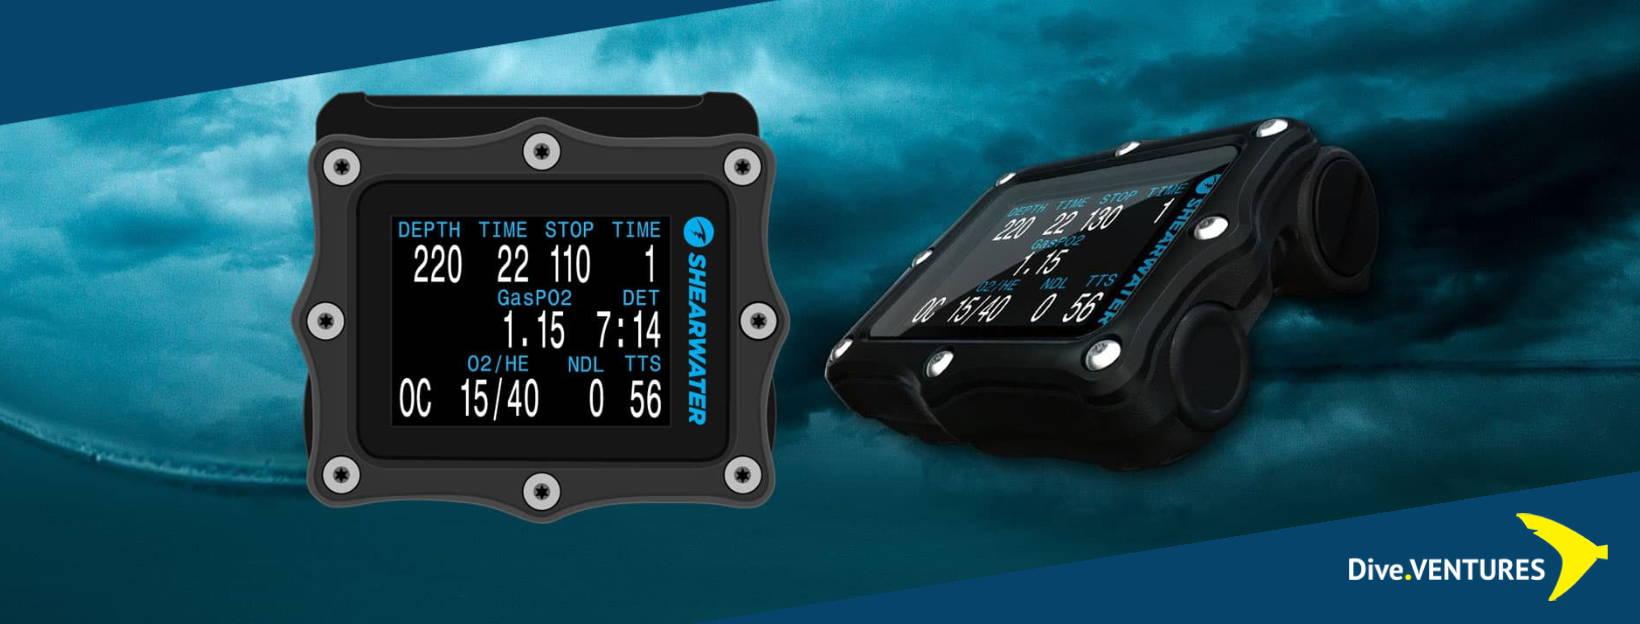 Shearwater Peregrine Dive Computer | Dive.VENTURES